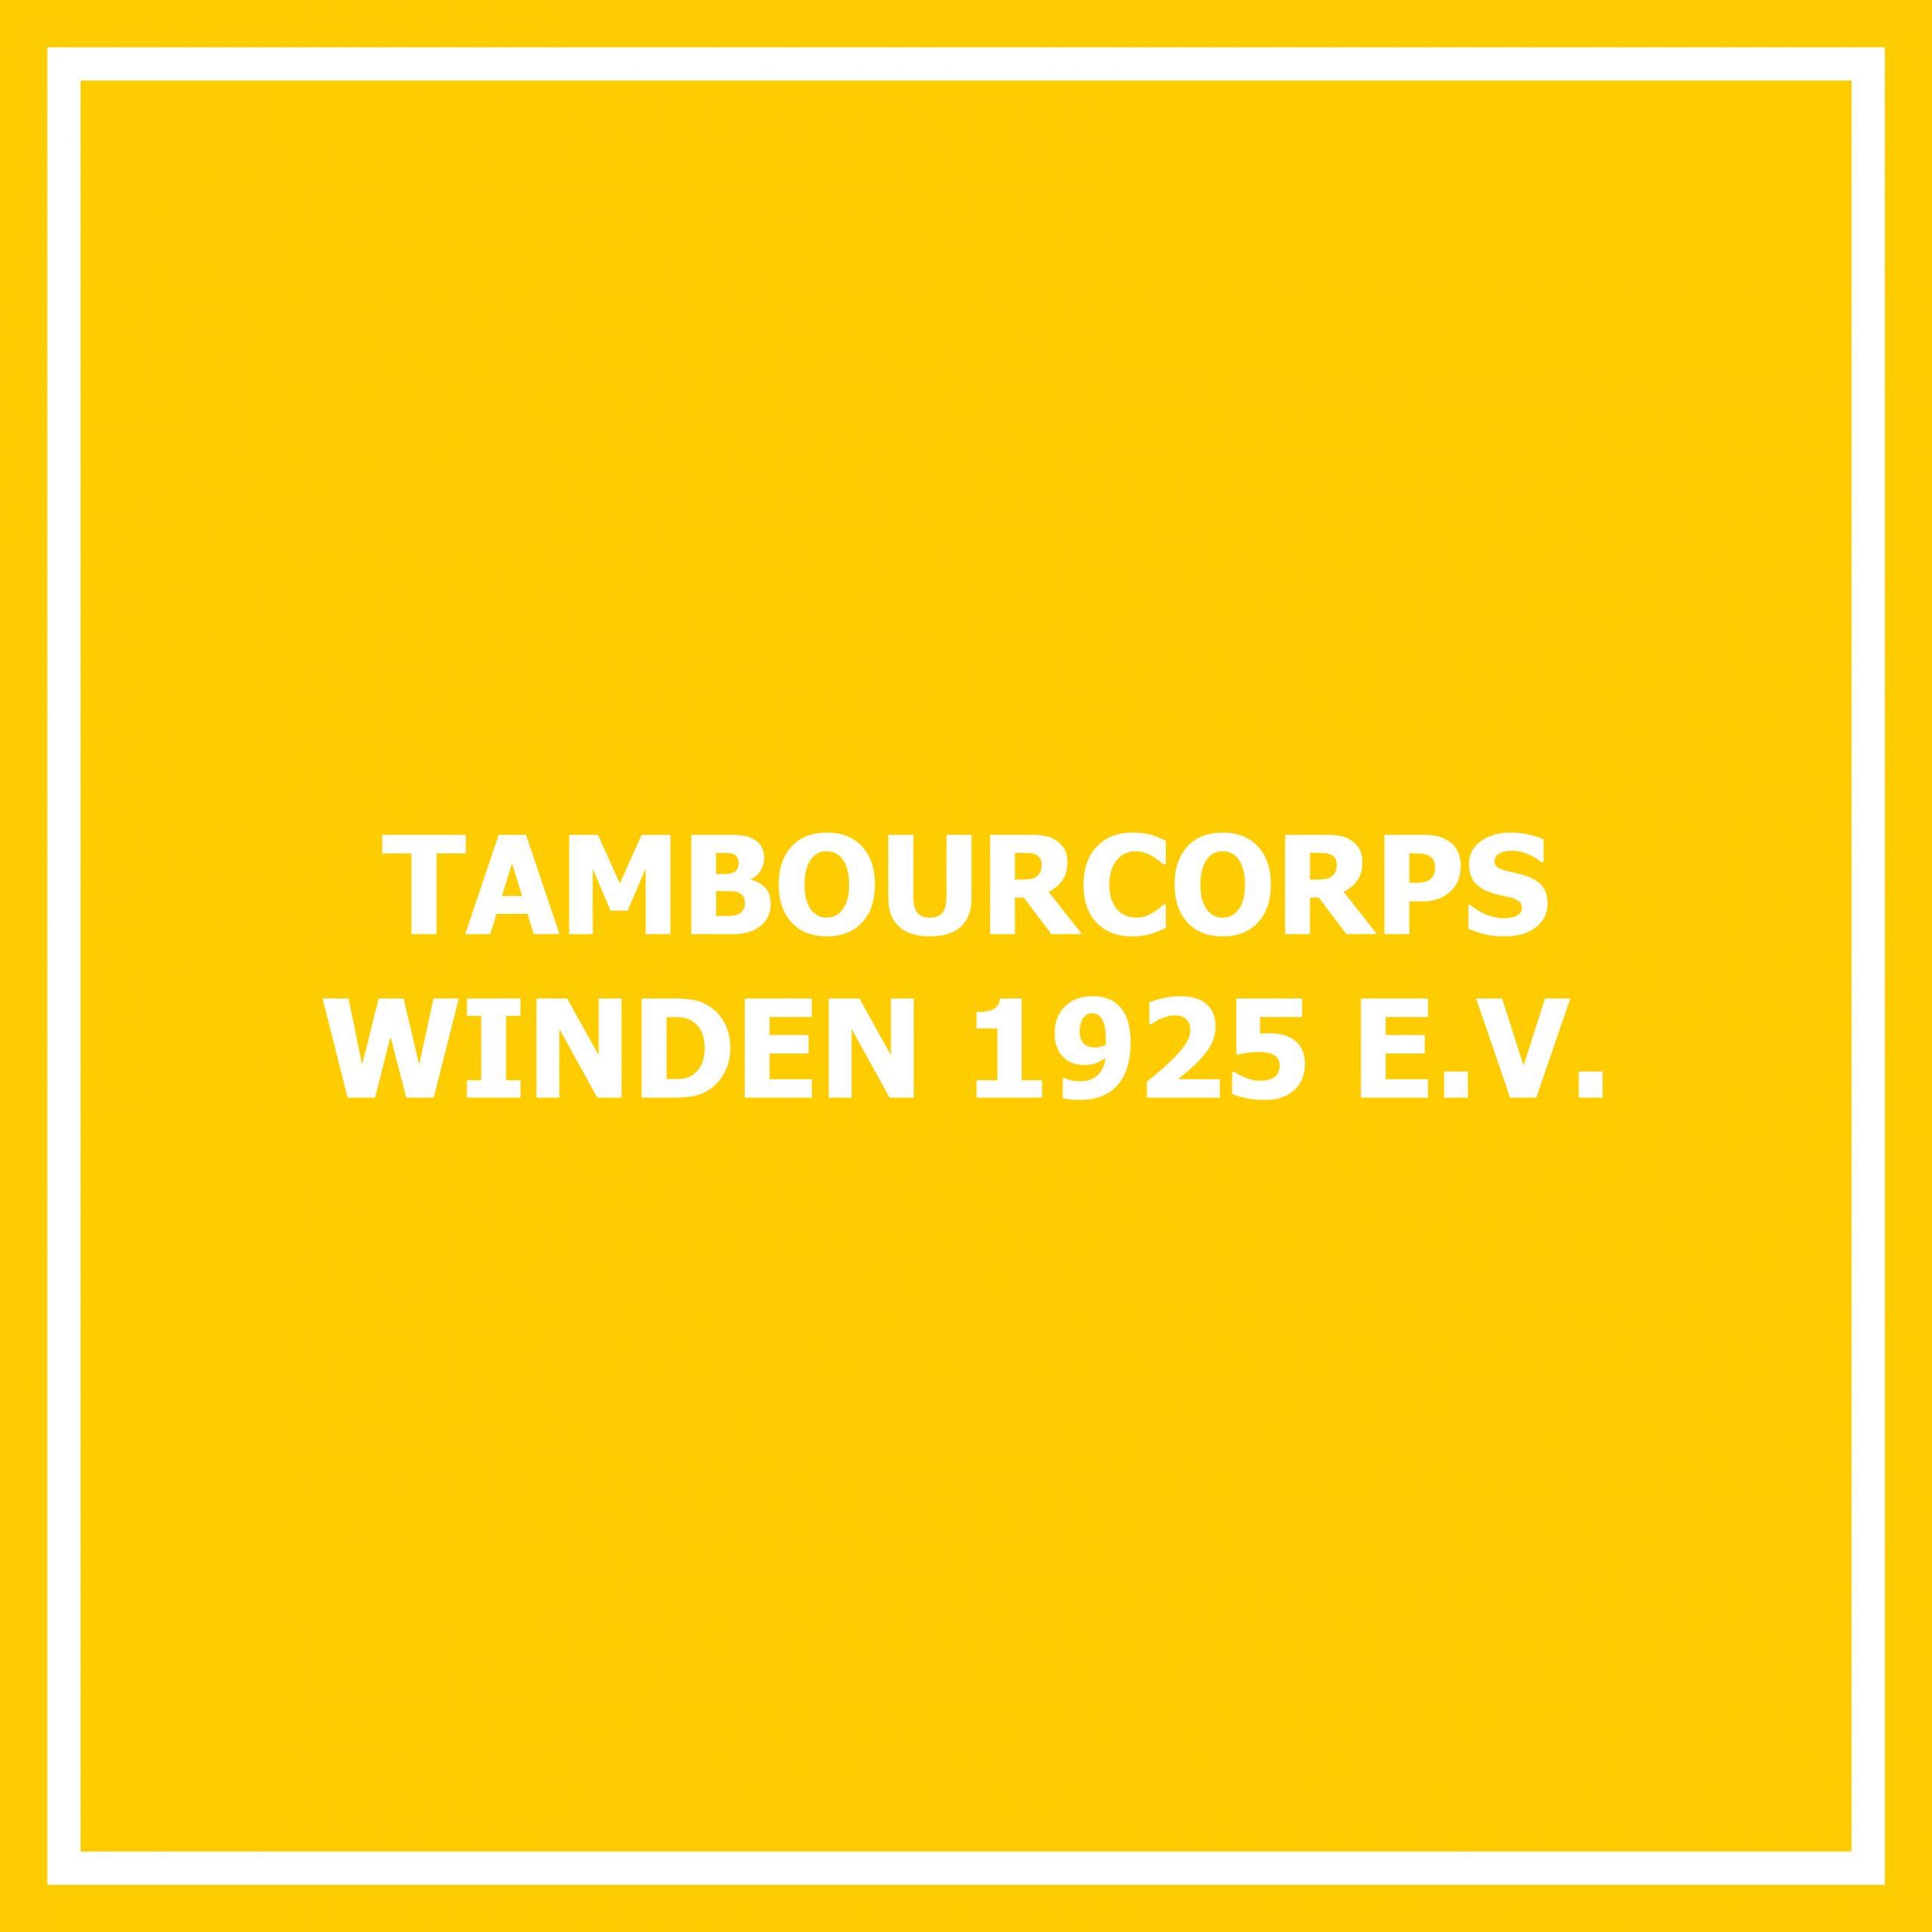 Tambourcorps Winden 1925 e. V.